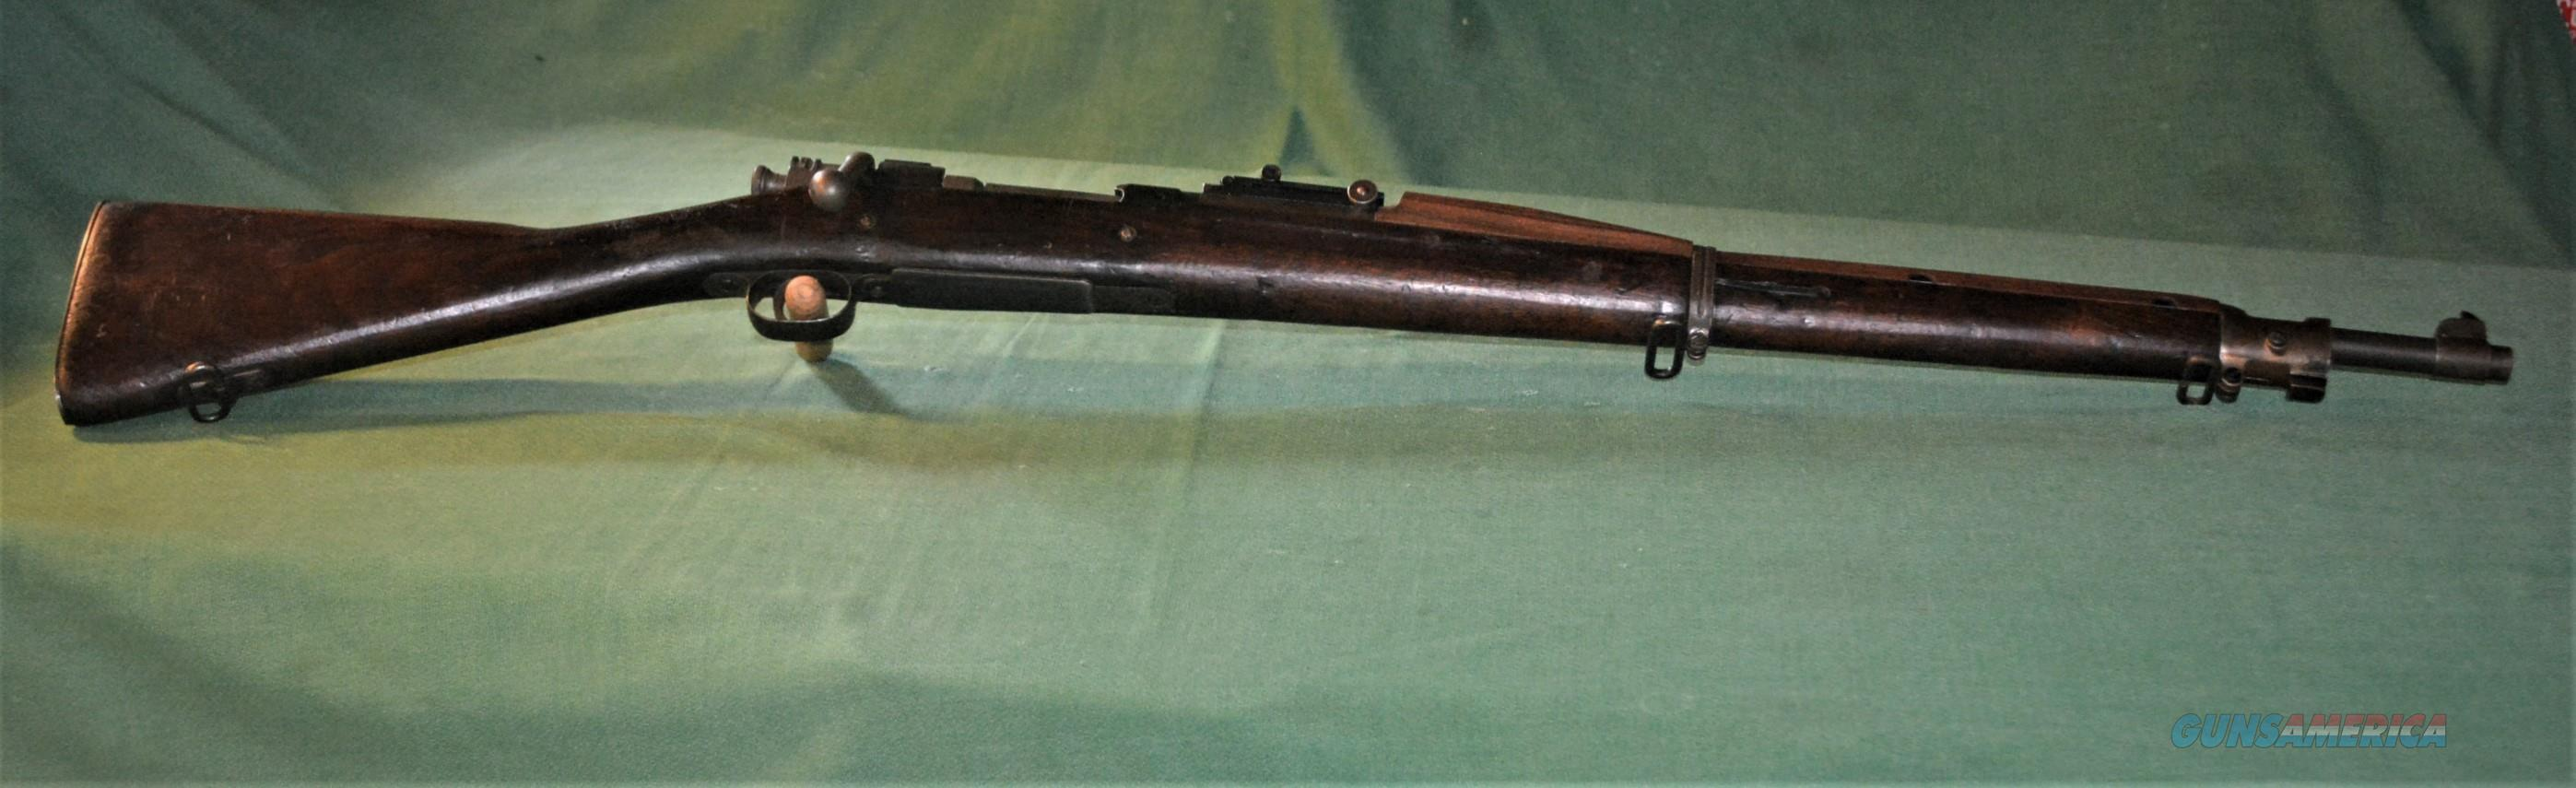 US Model 1903 Springfield  Guns > Rifles > Military Misc. Rifles US > 1903 Springfield/Variants